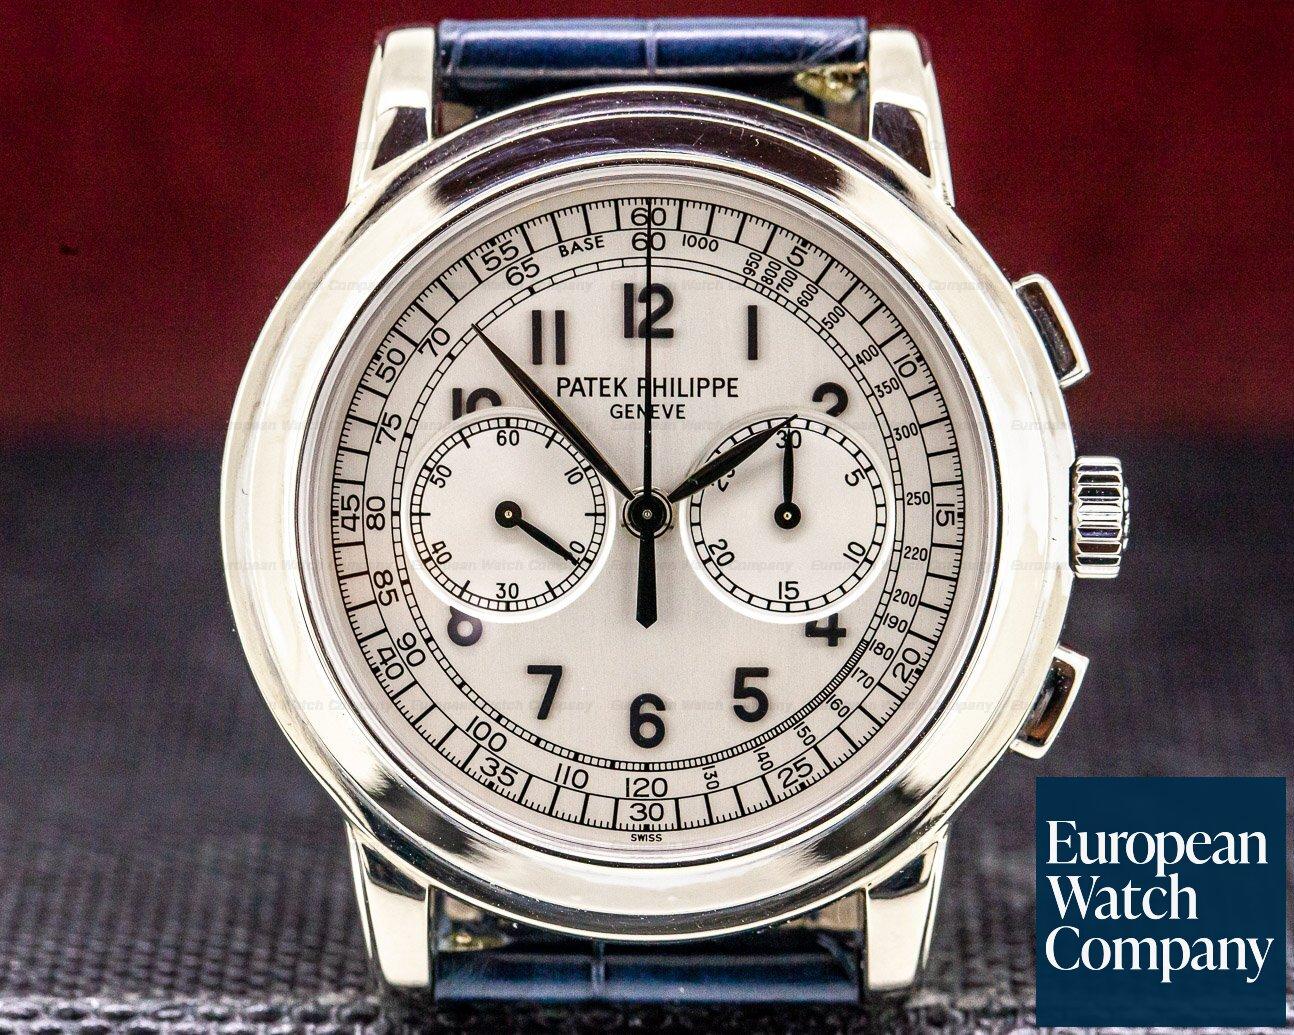 (31448) Patek Philippe 5070G 5070 White Gold Chronograph